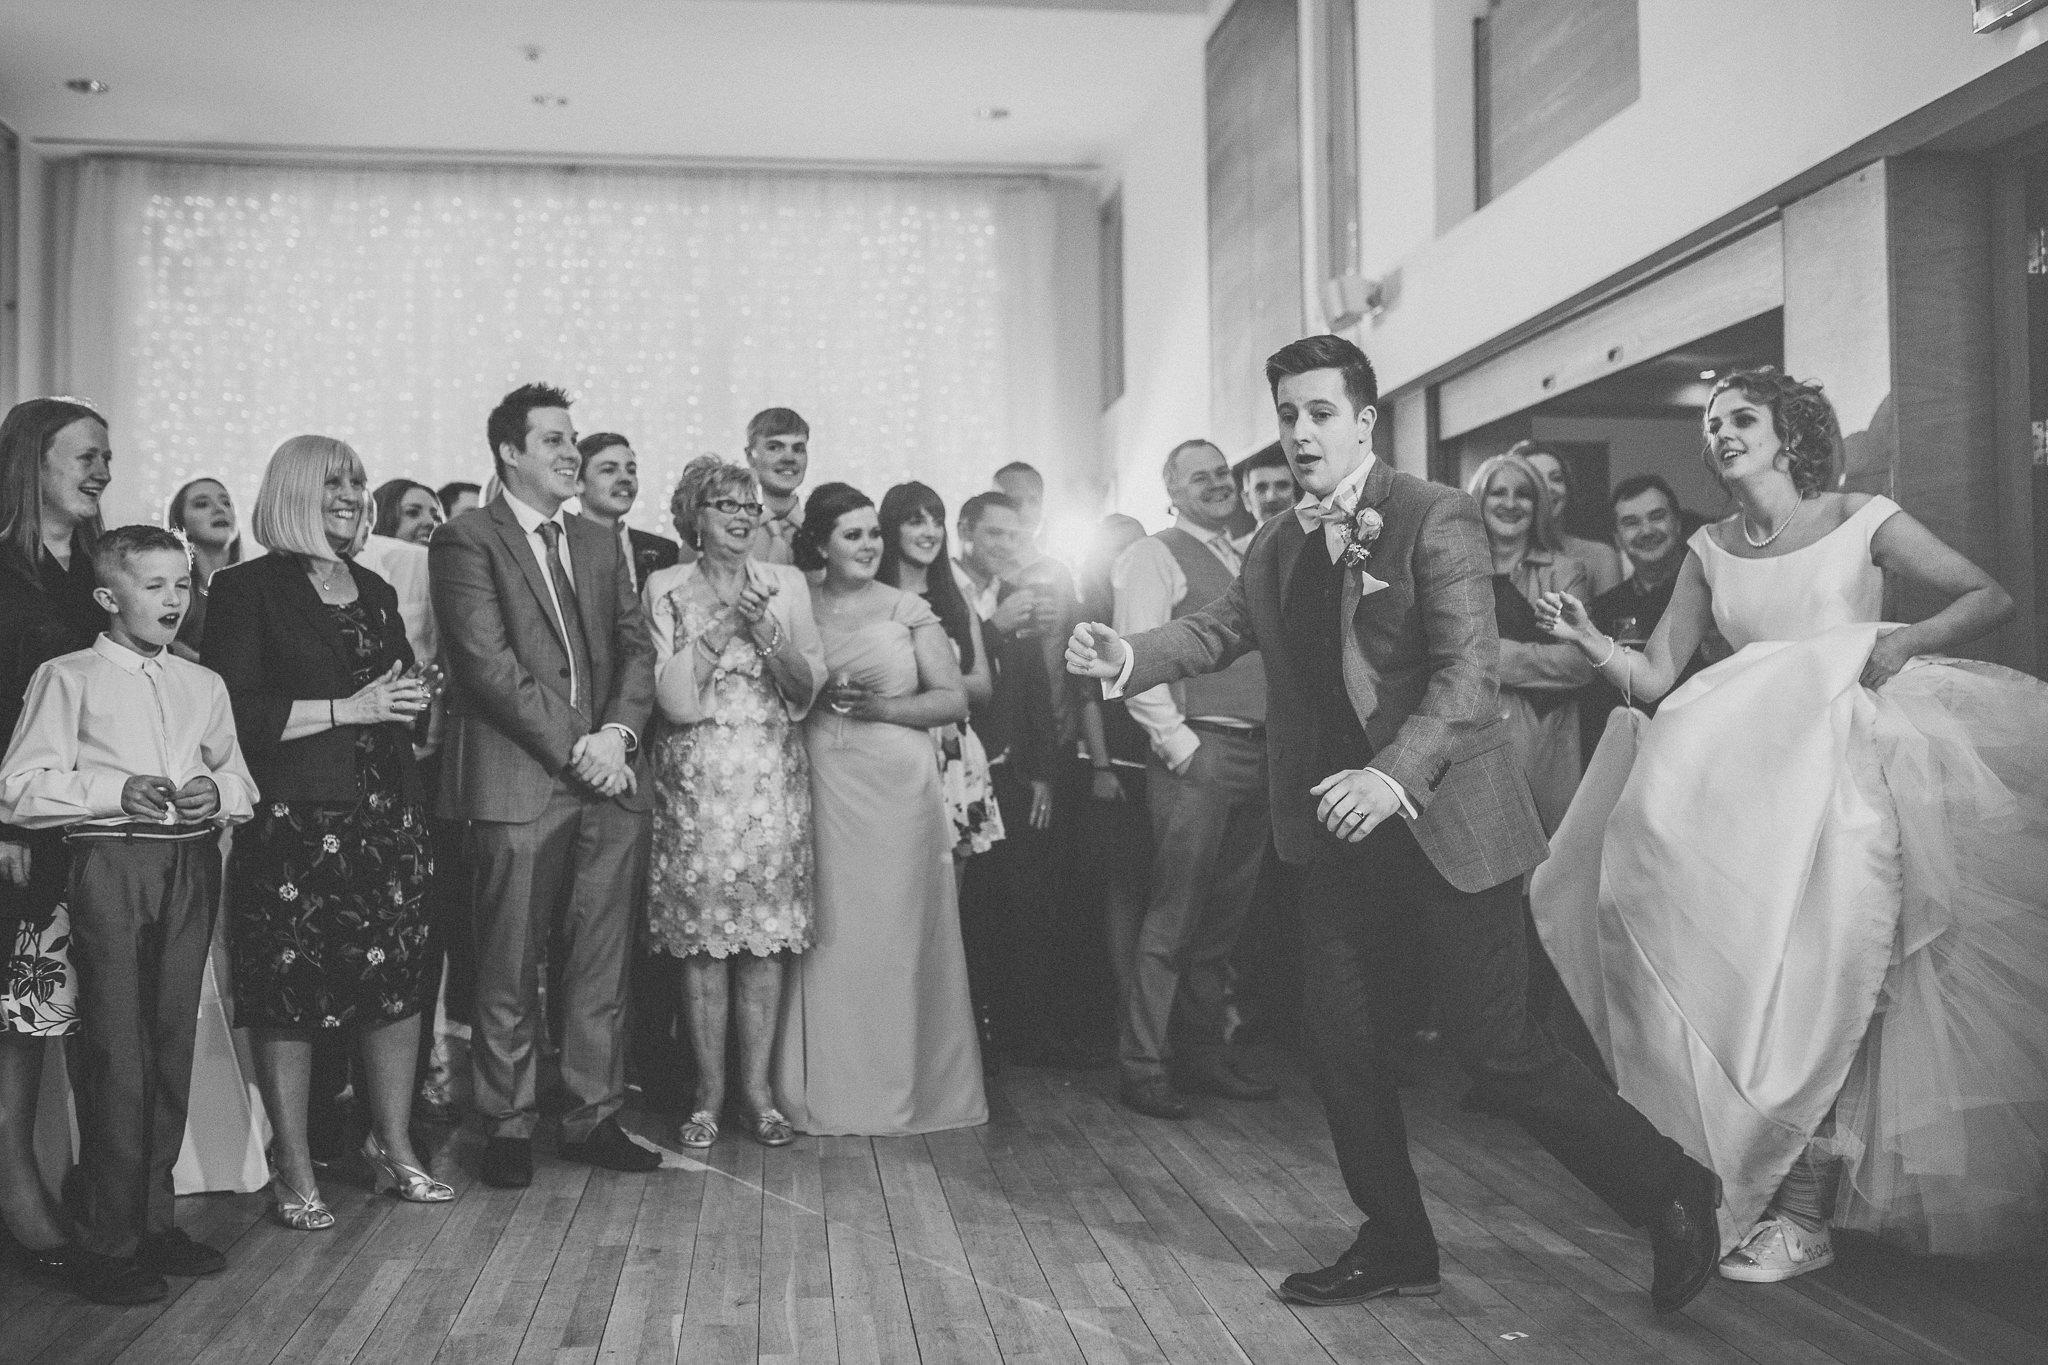 Lancashire-Creative-natural-documentary-wedding-photography-90083